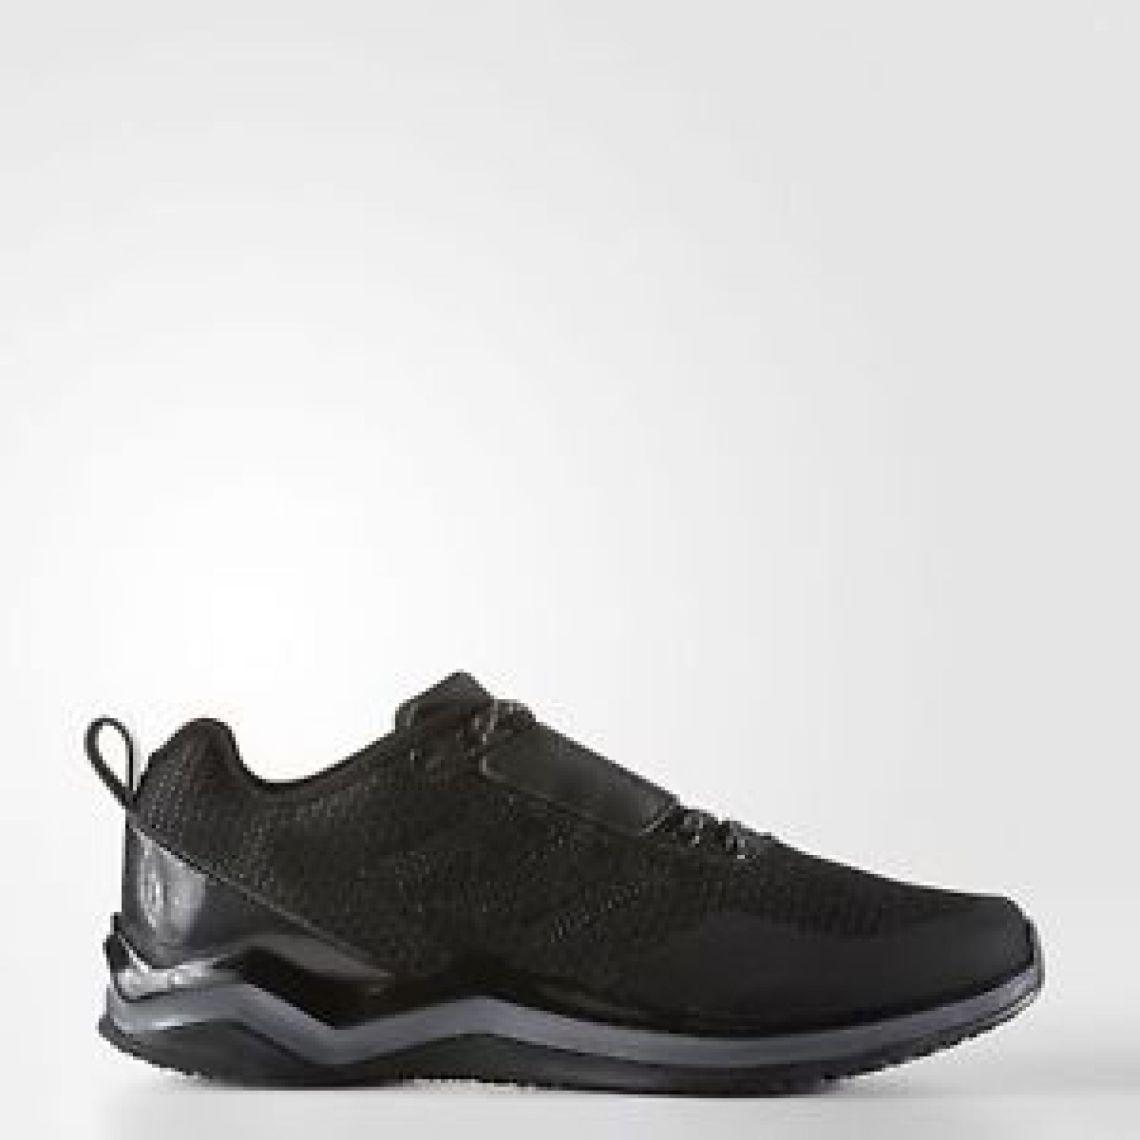 adidas Speed Trainer 3 Shoes Men's | eBay